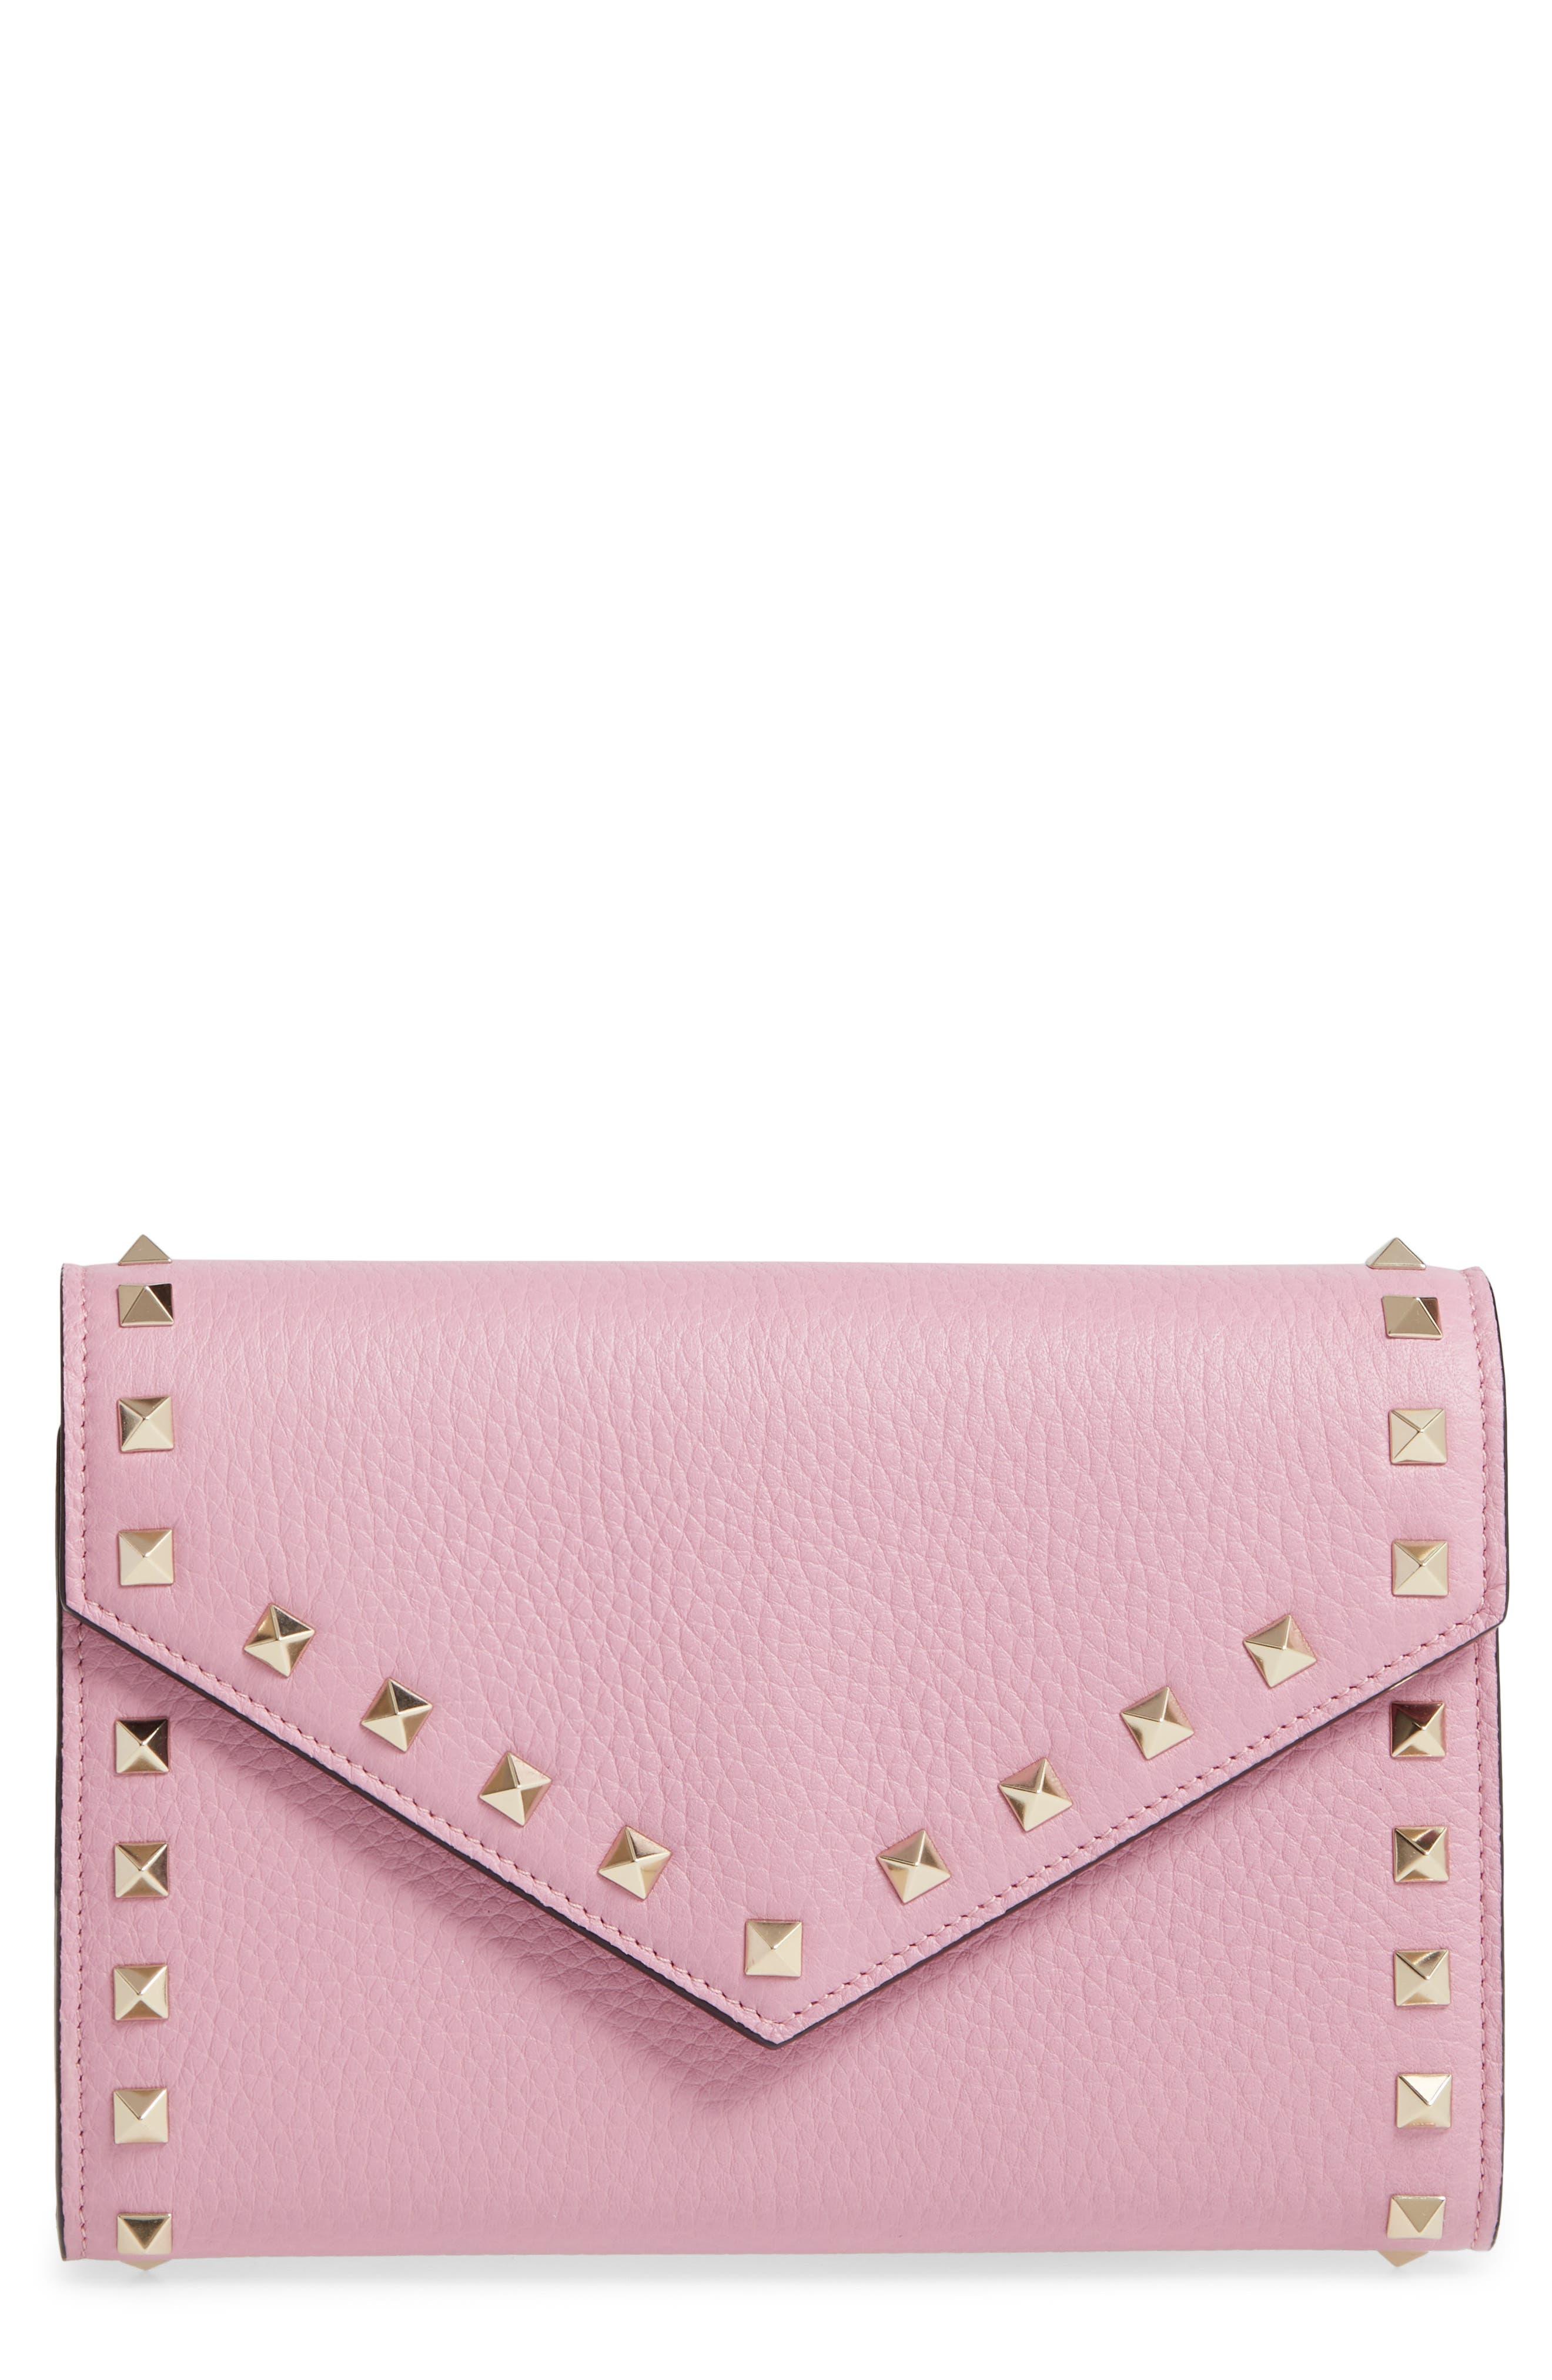 VALENTINO GARAVANI Rocktstud V-Flap Calfskin Leather Wallet on a Chain, Main, color, GIACINTO